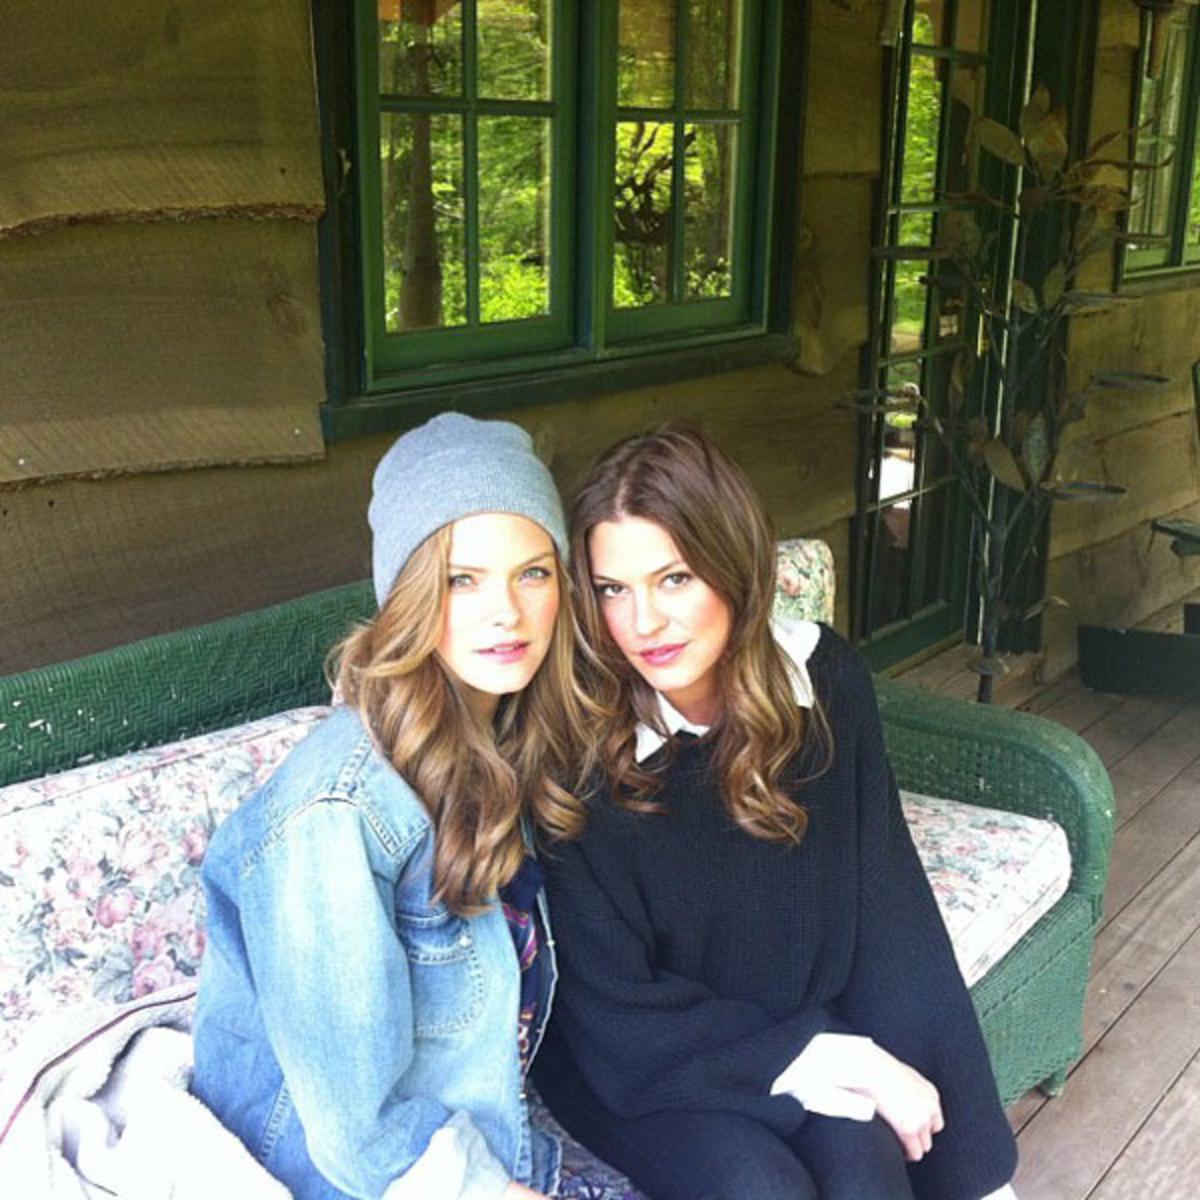 Jessica Perez and Dominique Piek :: @jesslperez